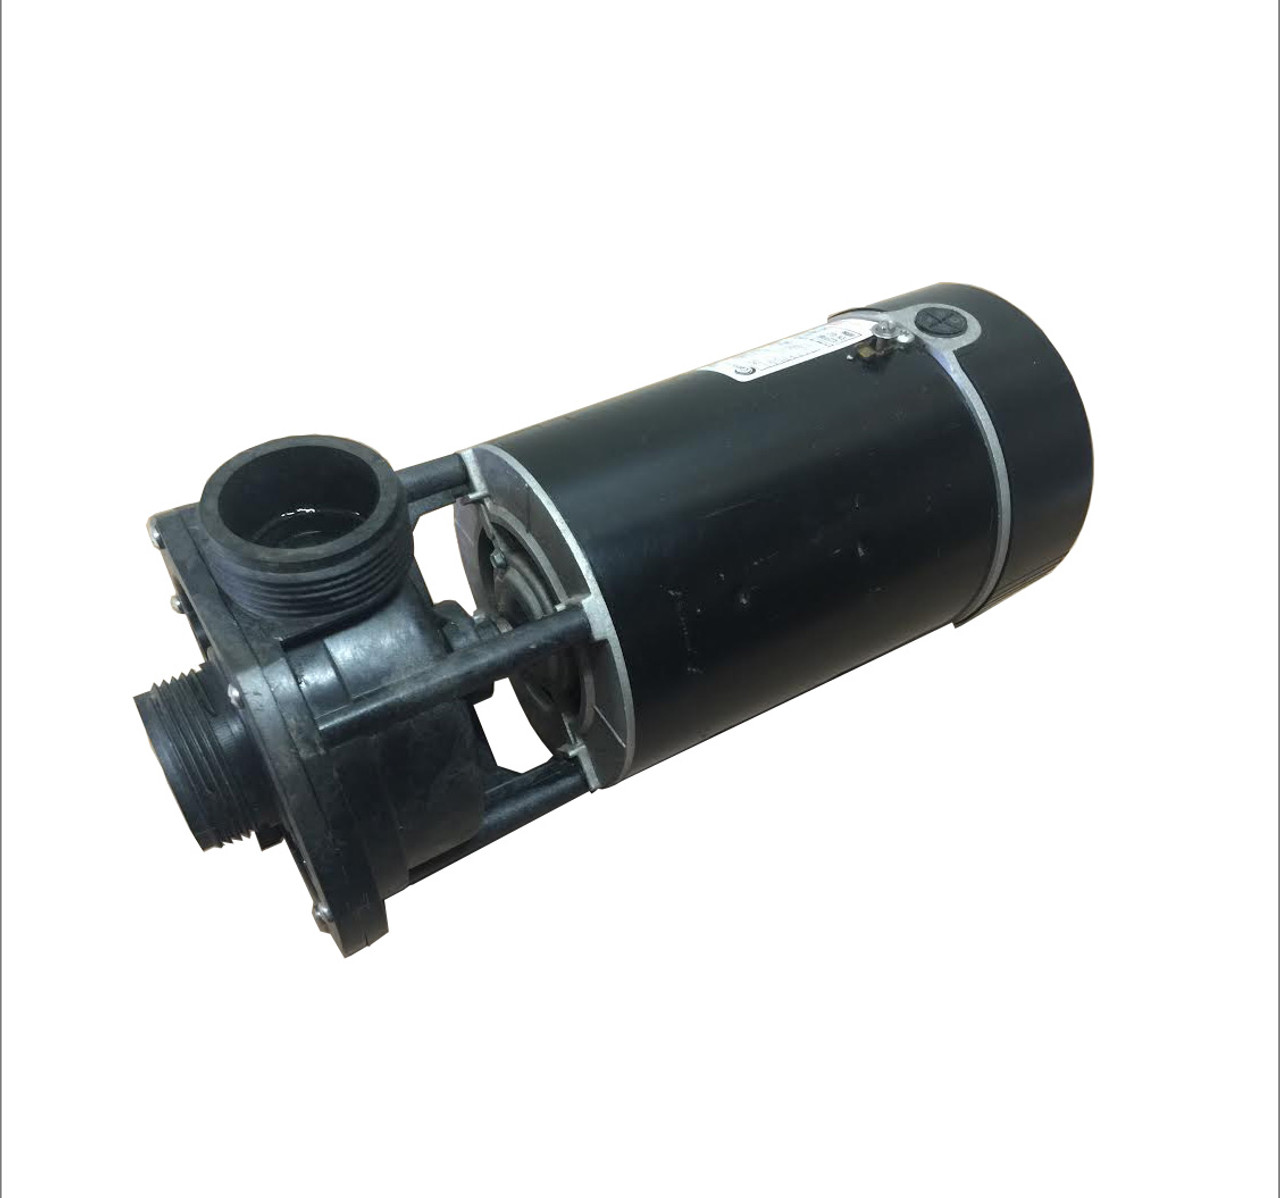 medium resolution of replacement for softub hot tub pump 115 volt 03510138 2 spa parts depot